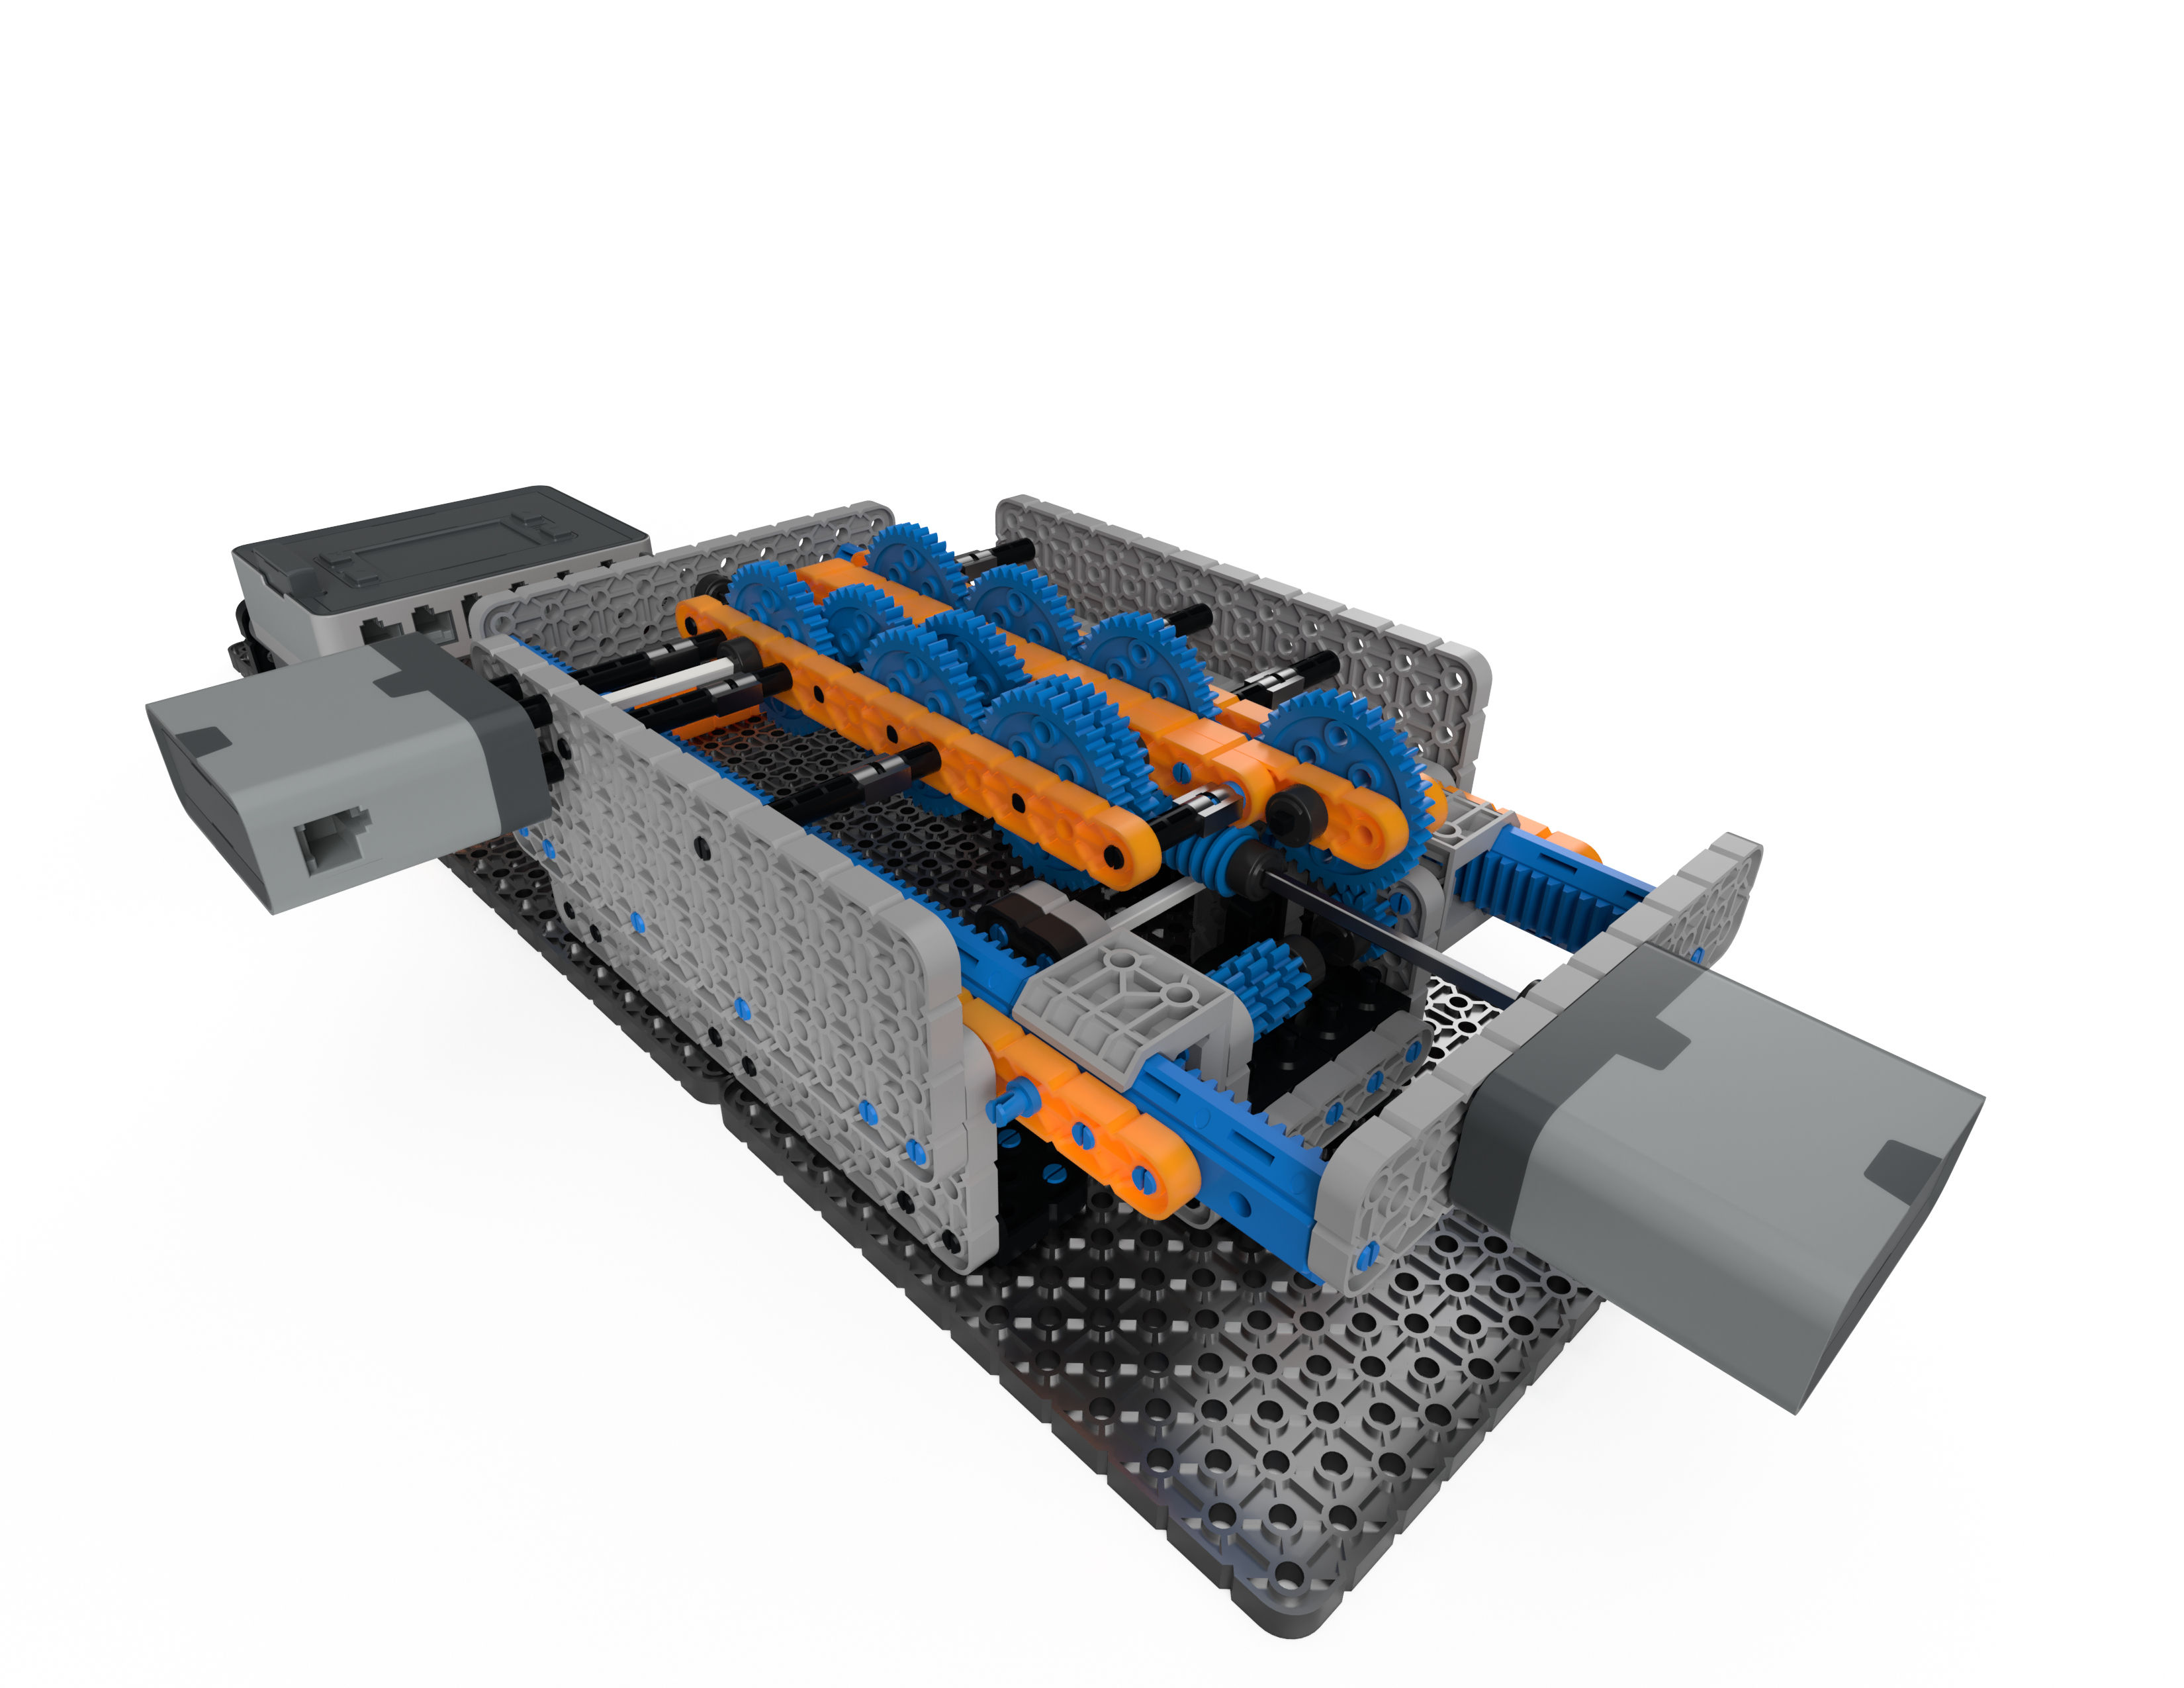 dynamics---vex-iq-robotics-2018-feb-15-03-16-43pm-000-customizedview36017173519-jpeg-3500-3500